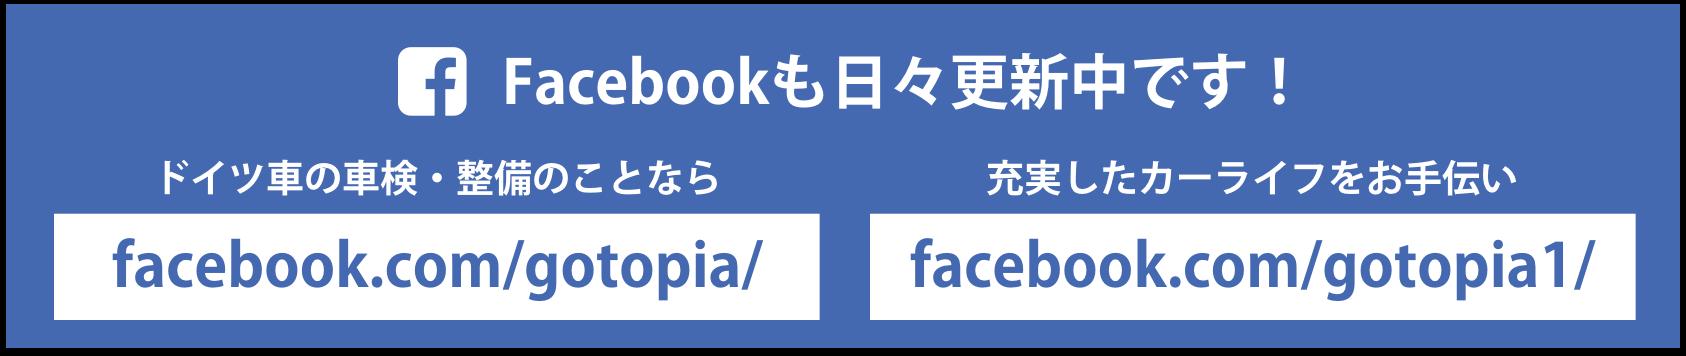 facebookページも更新中